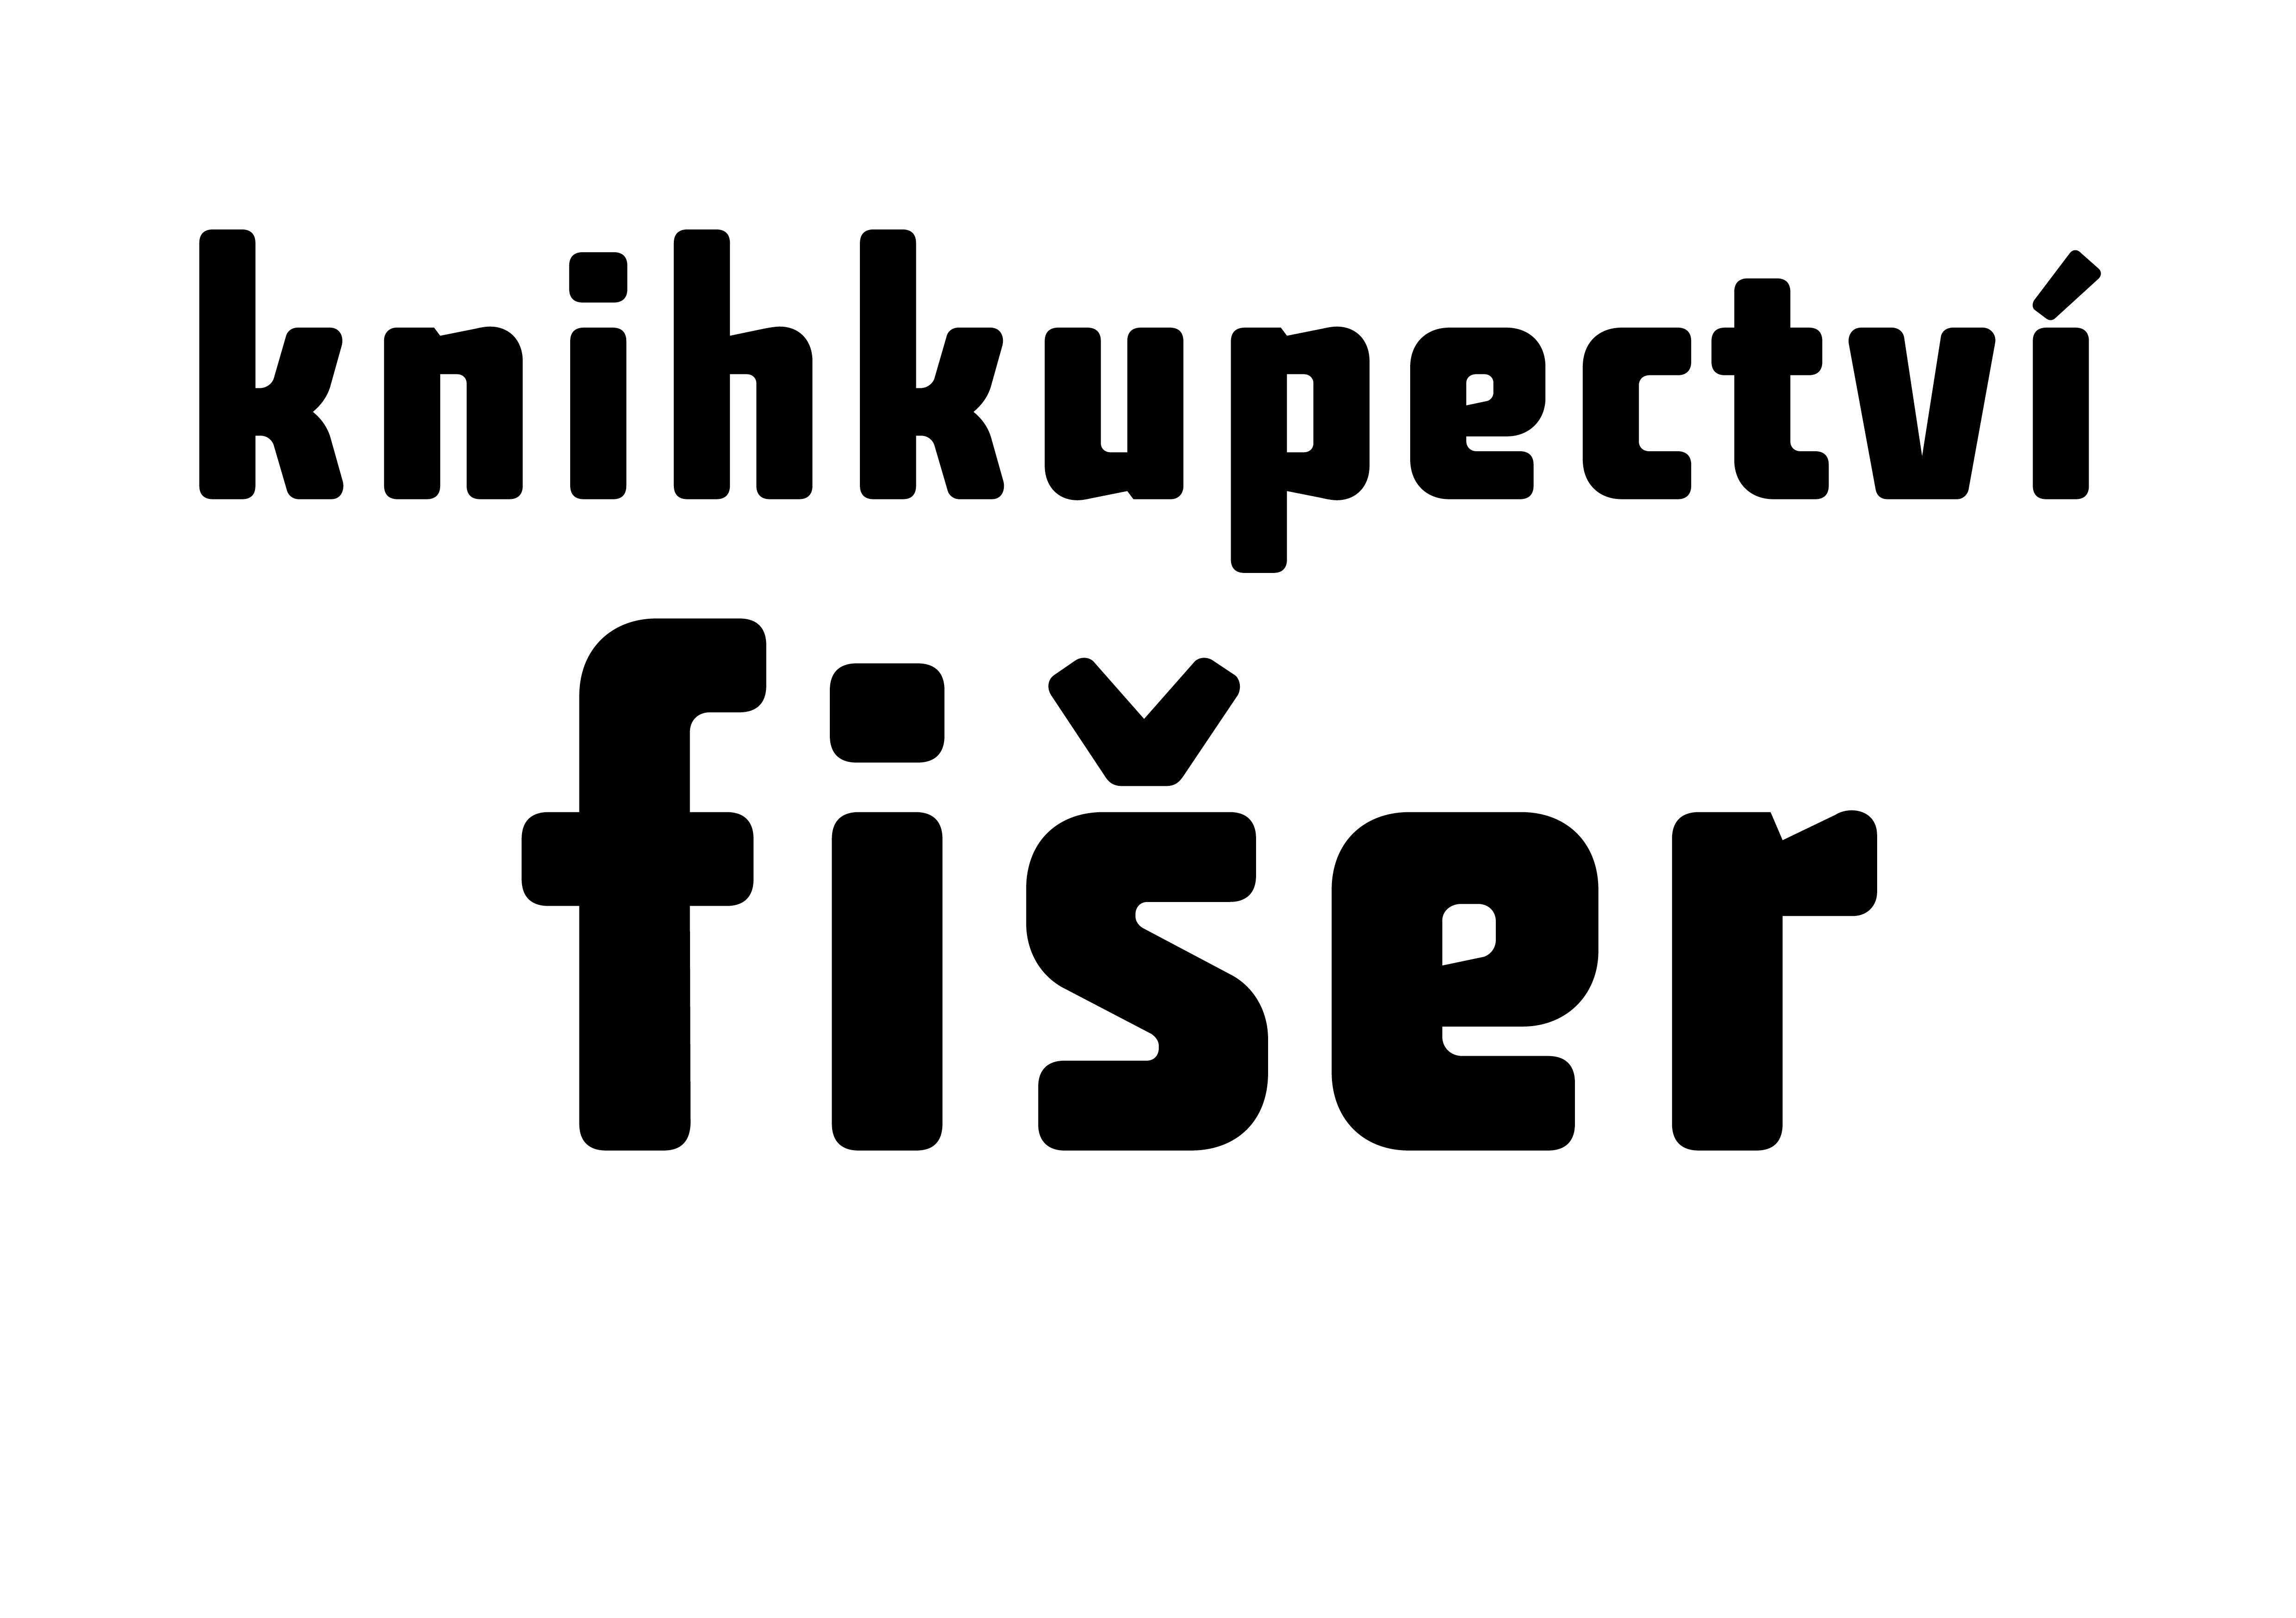 knihkupectvi-fiser